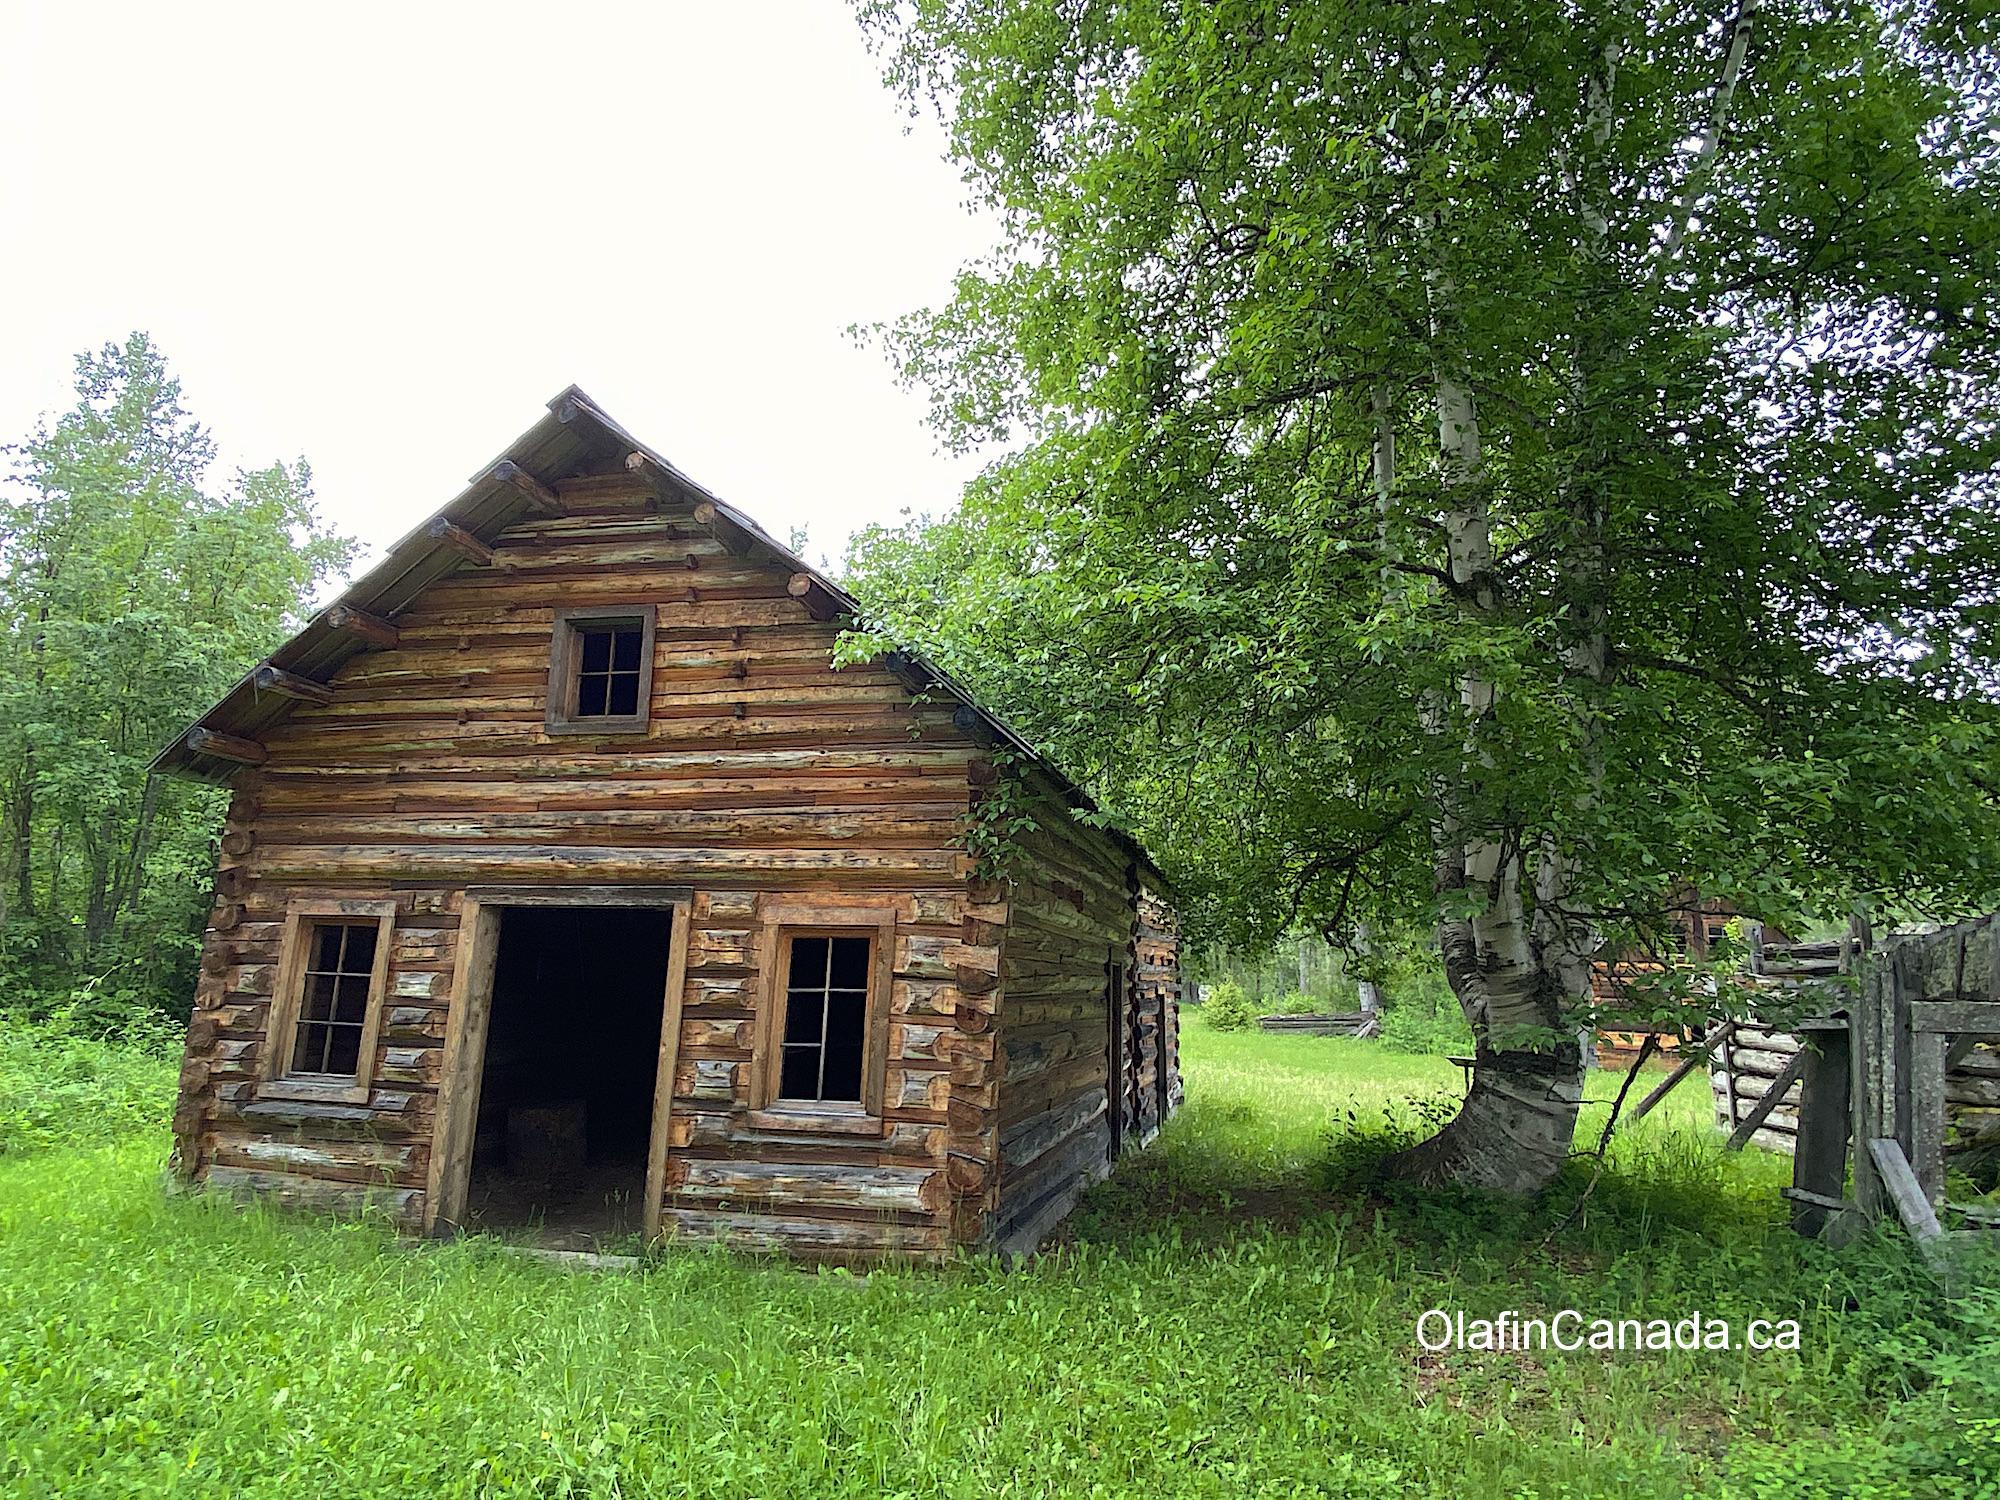 General Store in Quesnel Forks #olafincanada #britishcolumbia #discoverbc #abandonedbc #cariboo #quesnelforks